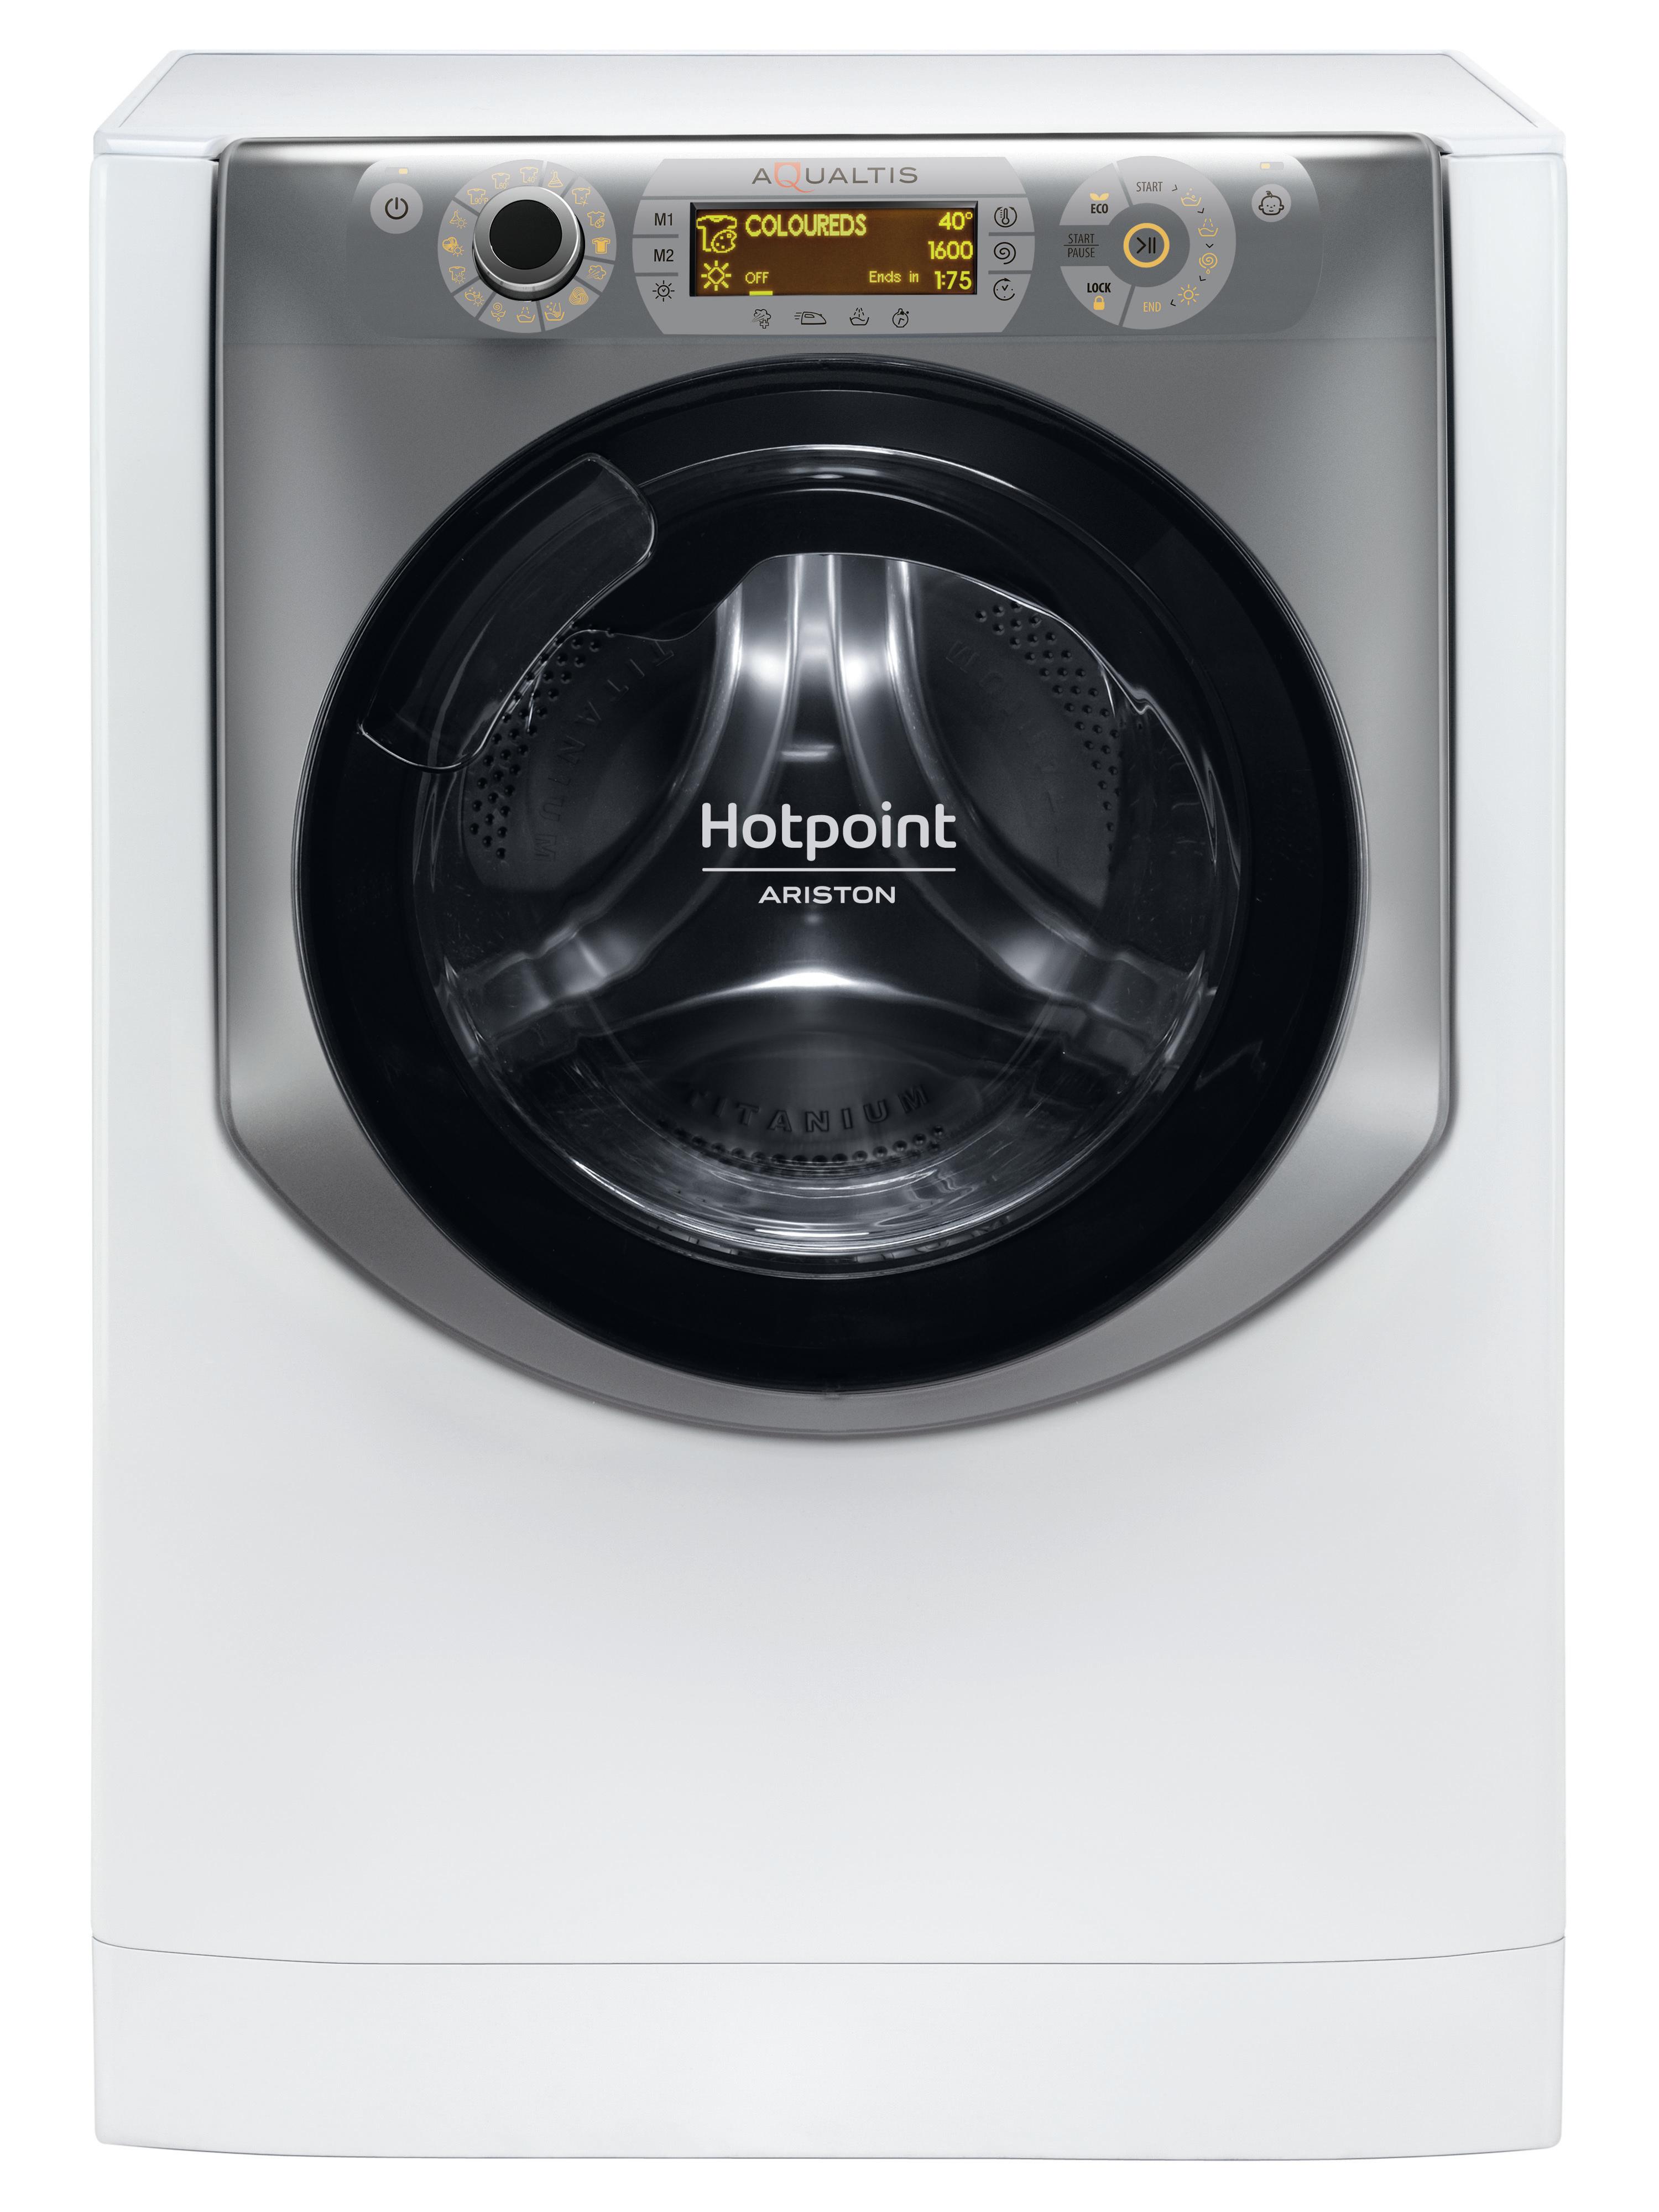 Hotpoint-ariston - Aqd1071d 697 Eu/a